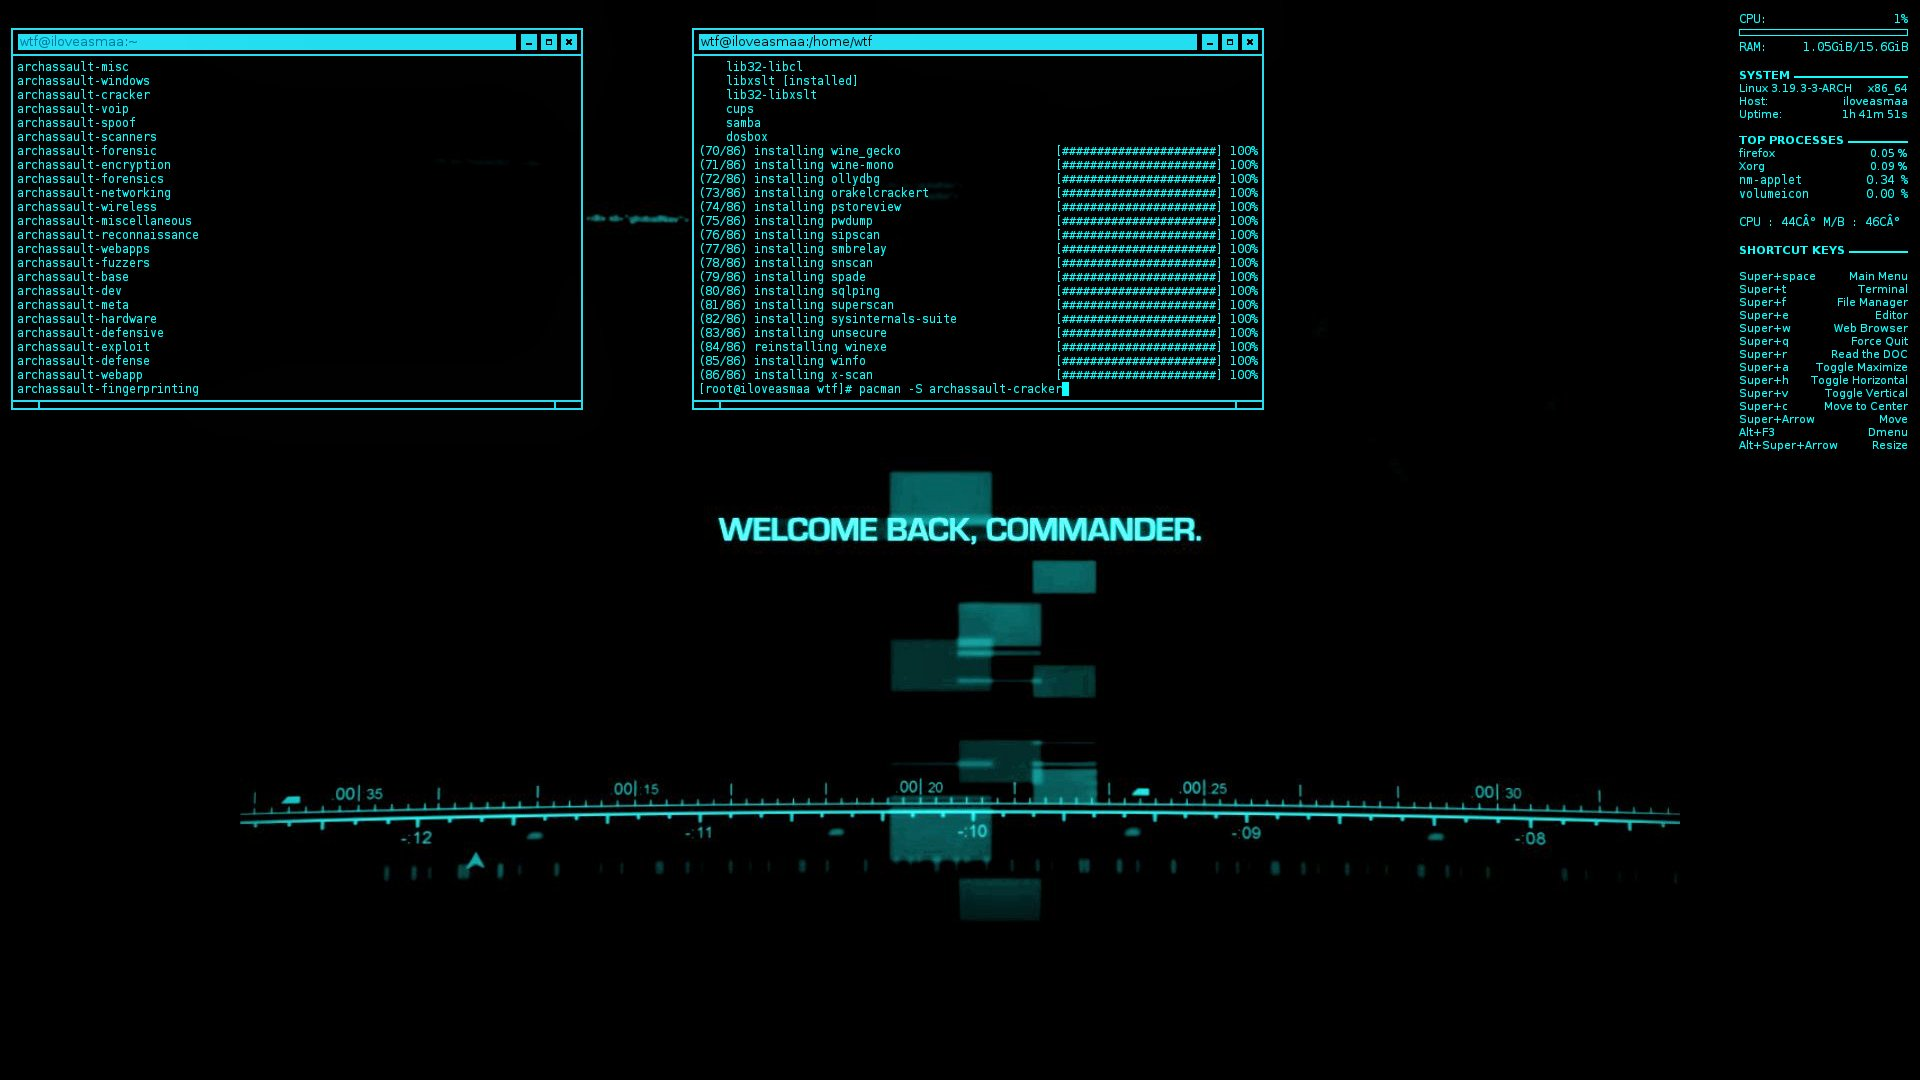 Anonymous Hacker Wallpaper 1920x1080